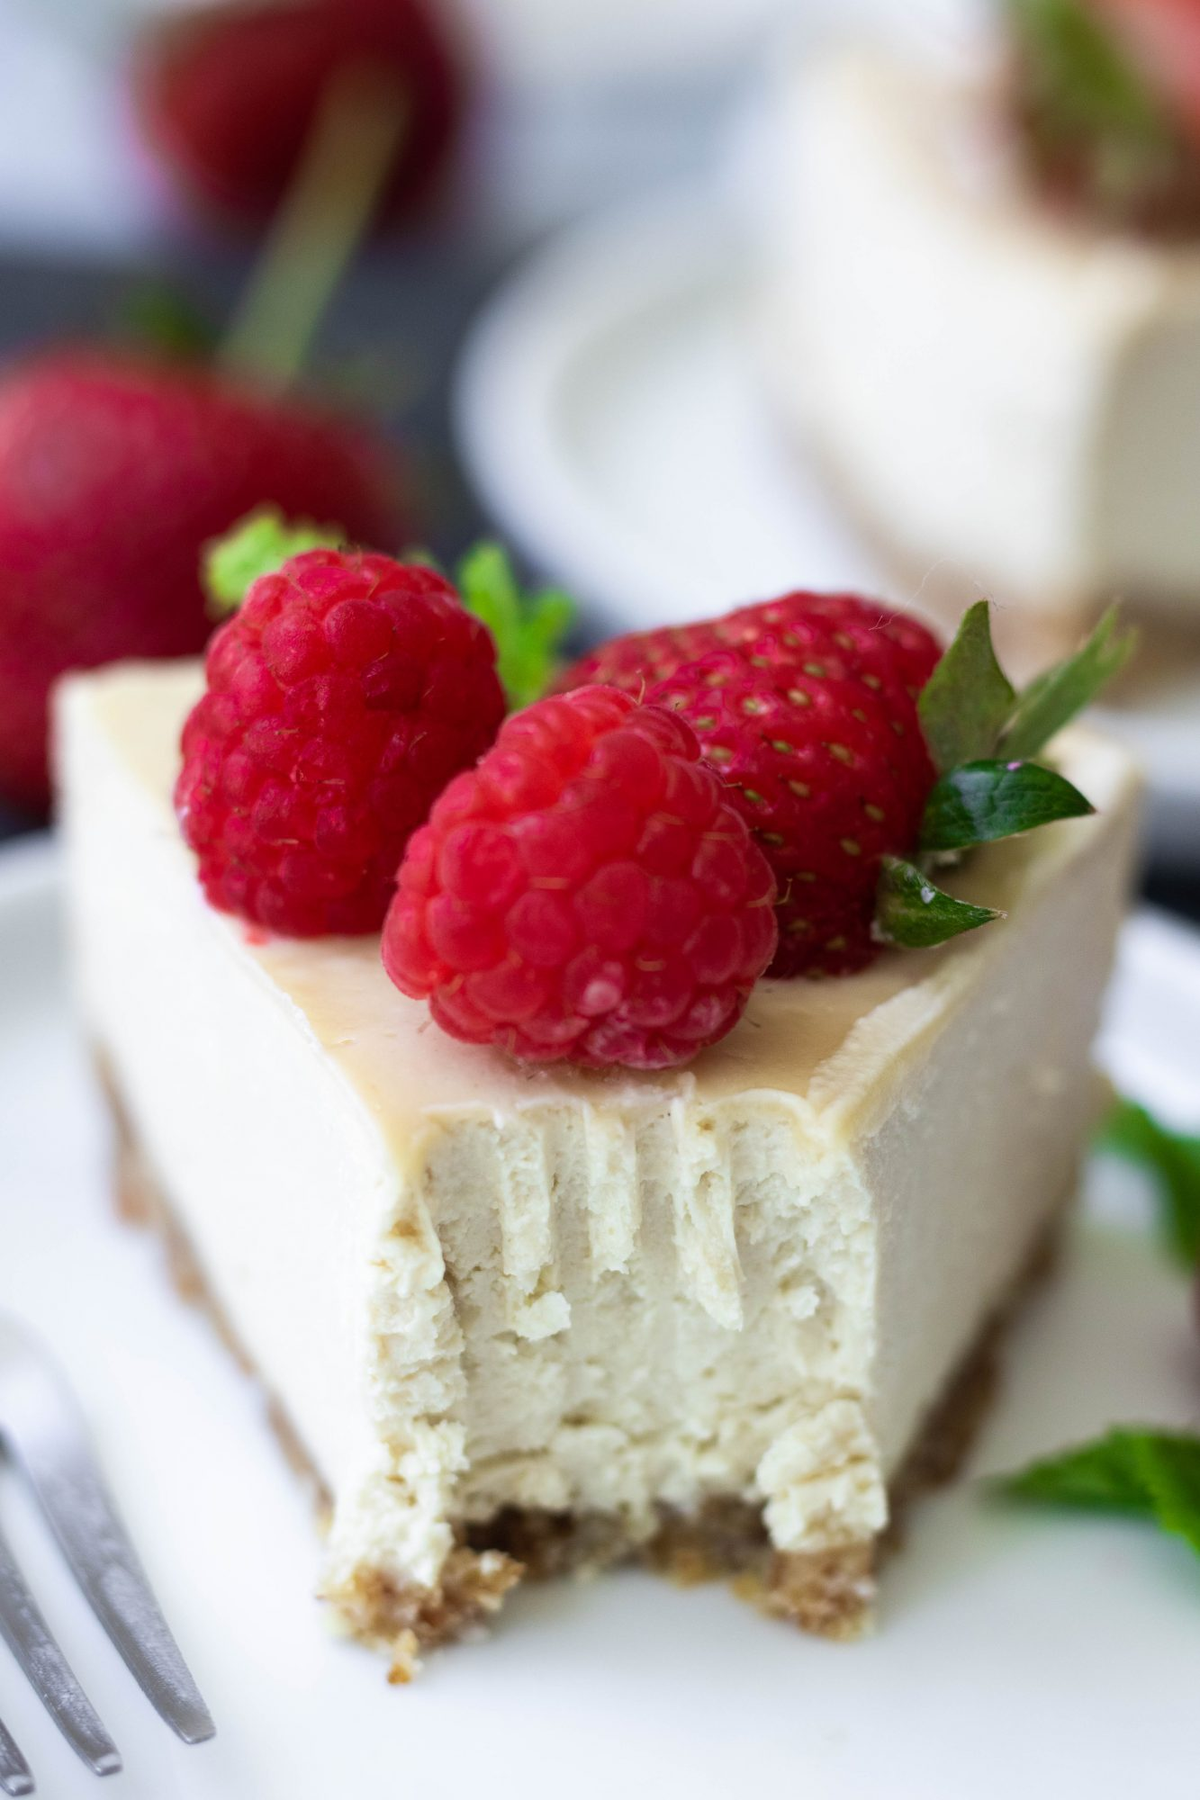 Close Up Bite Taken from Healthy Vegan Cheesecake